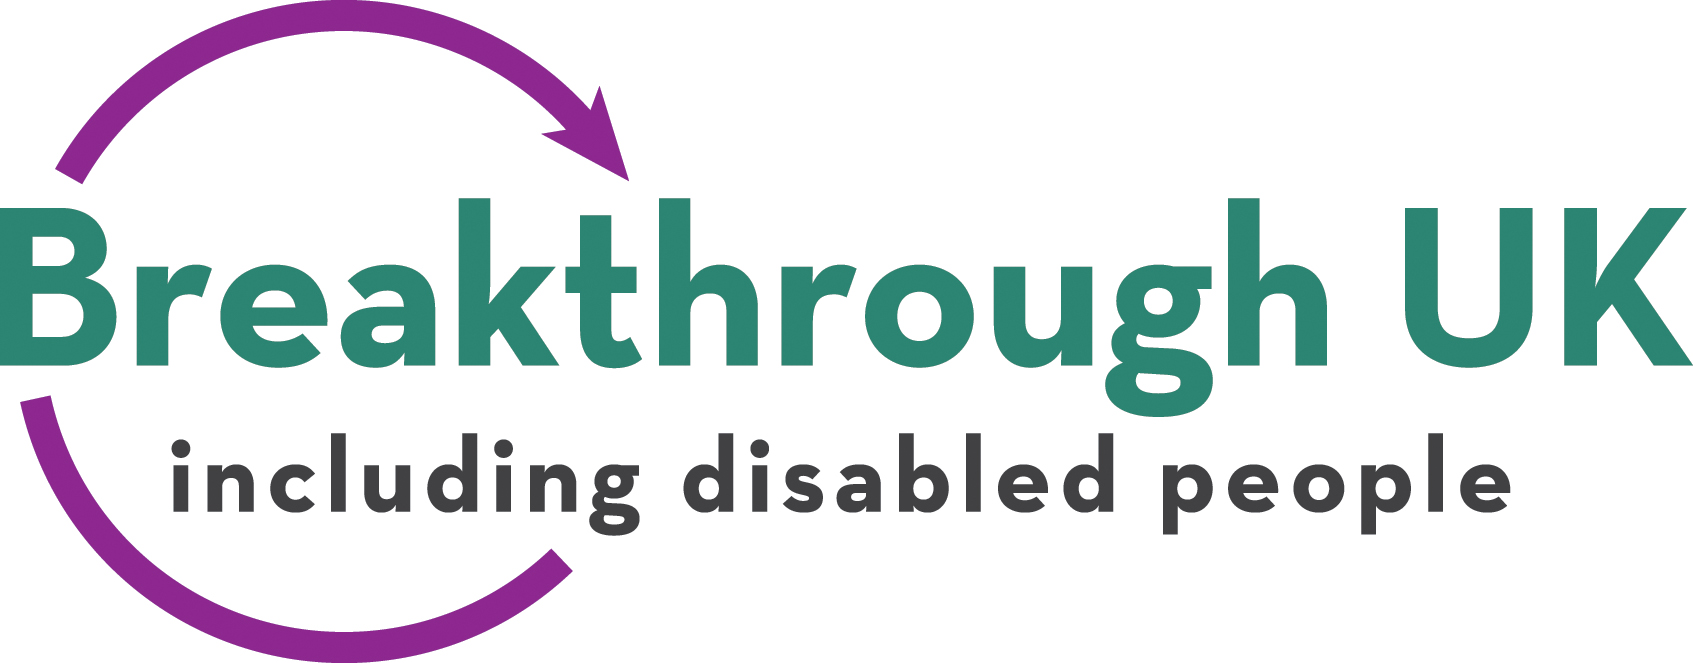 Breakthrough UK Logo - Breakthrough including disabled people